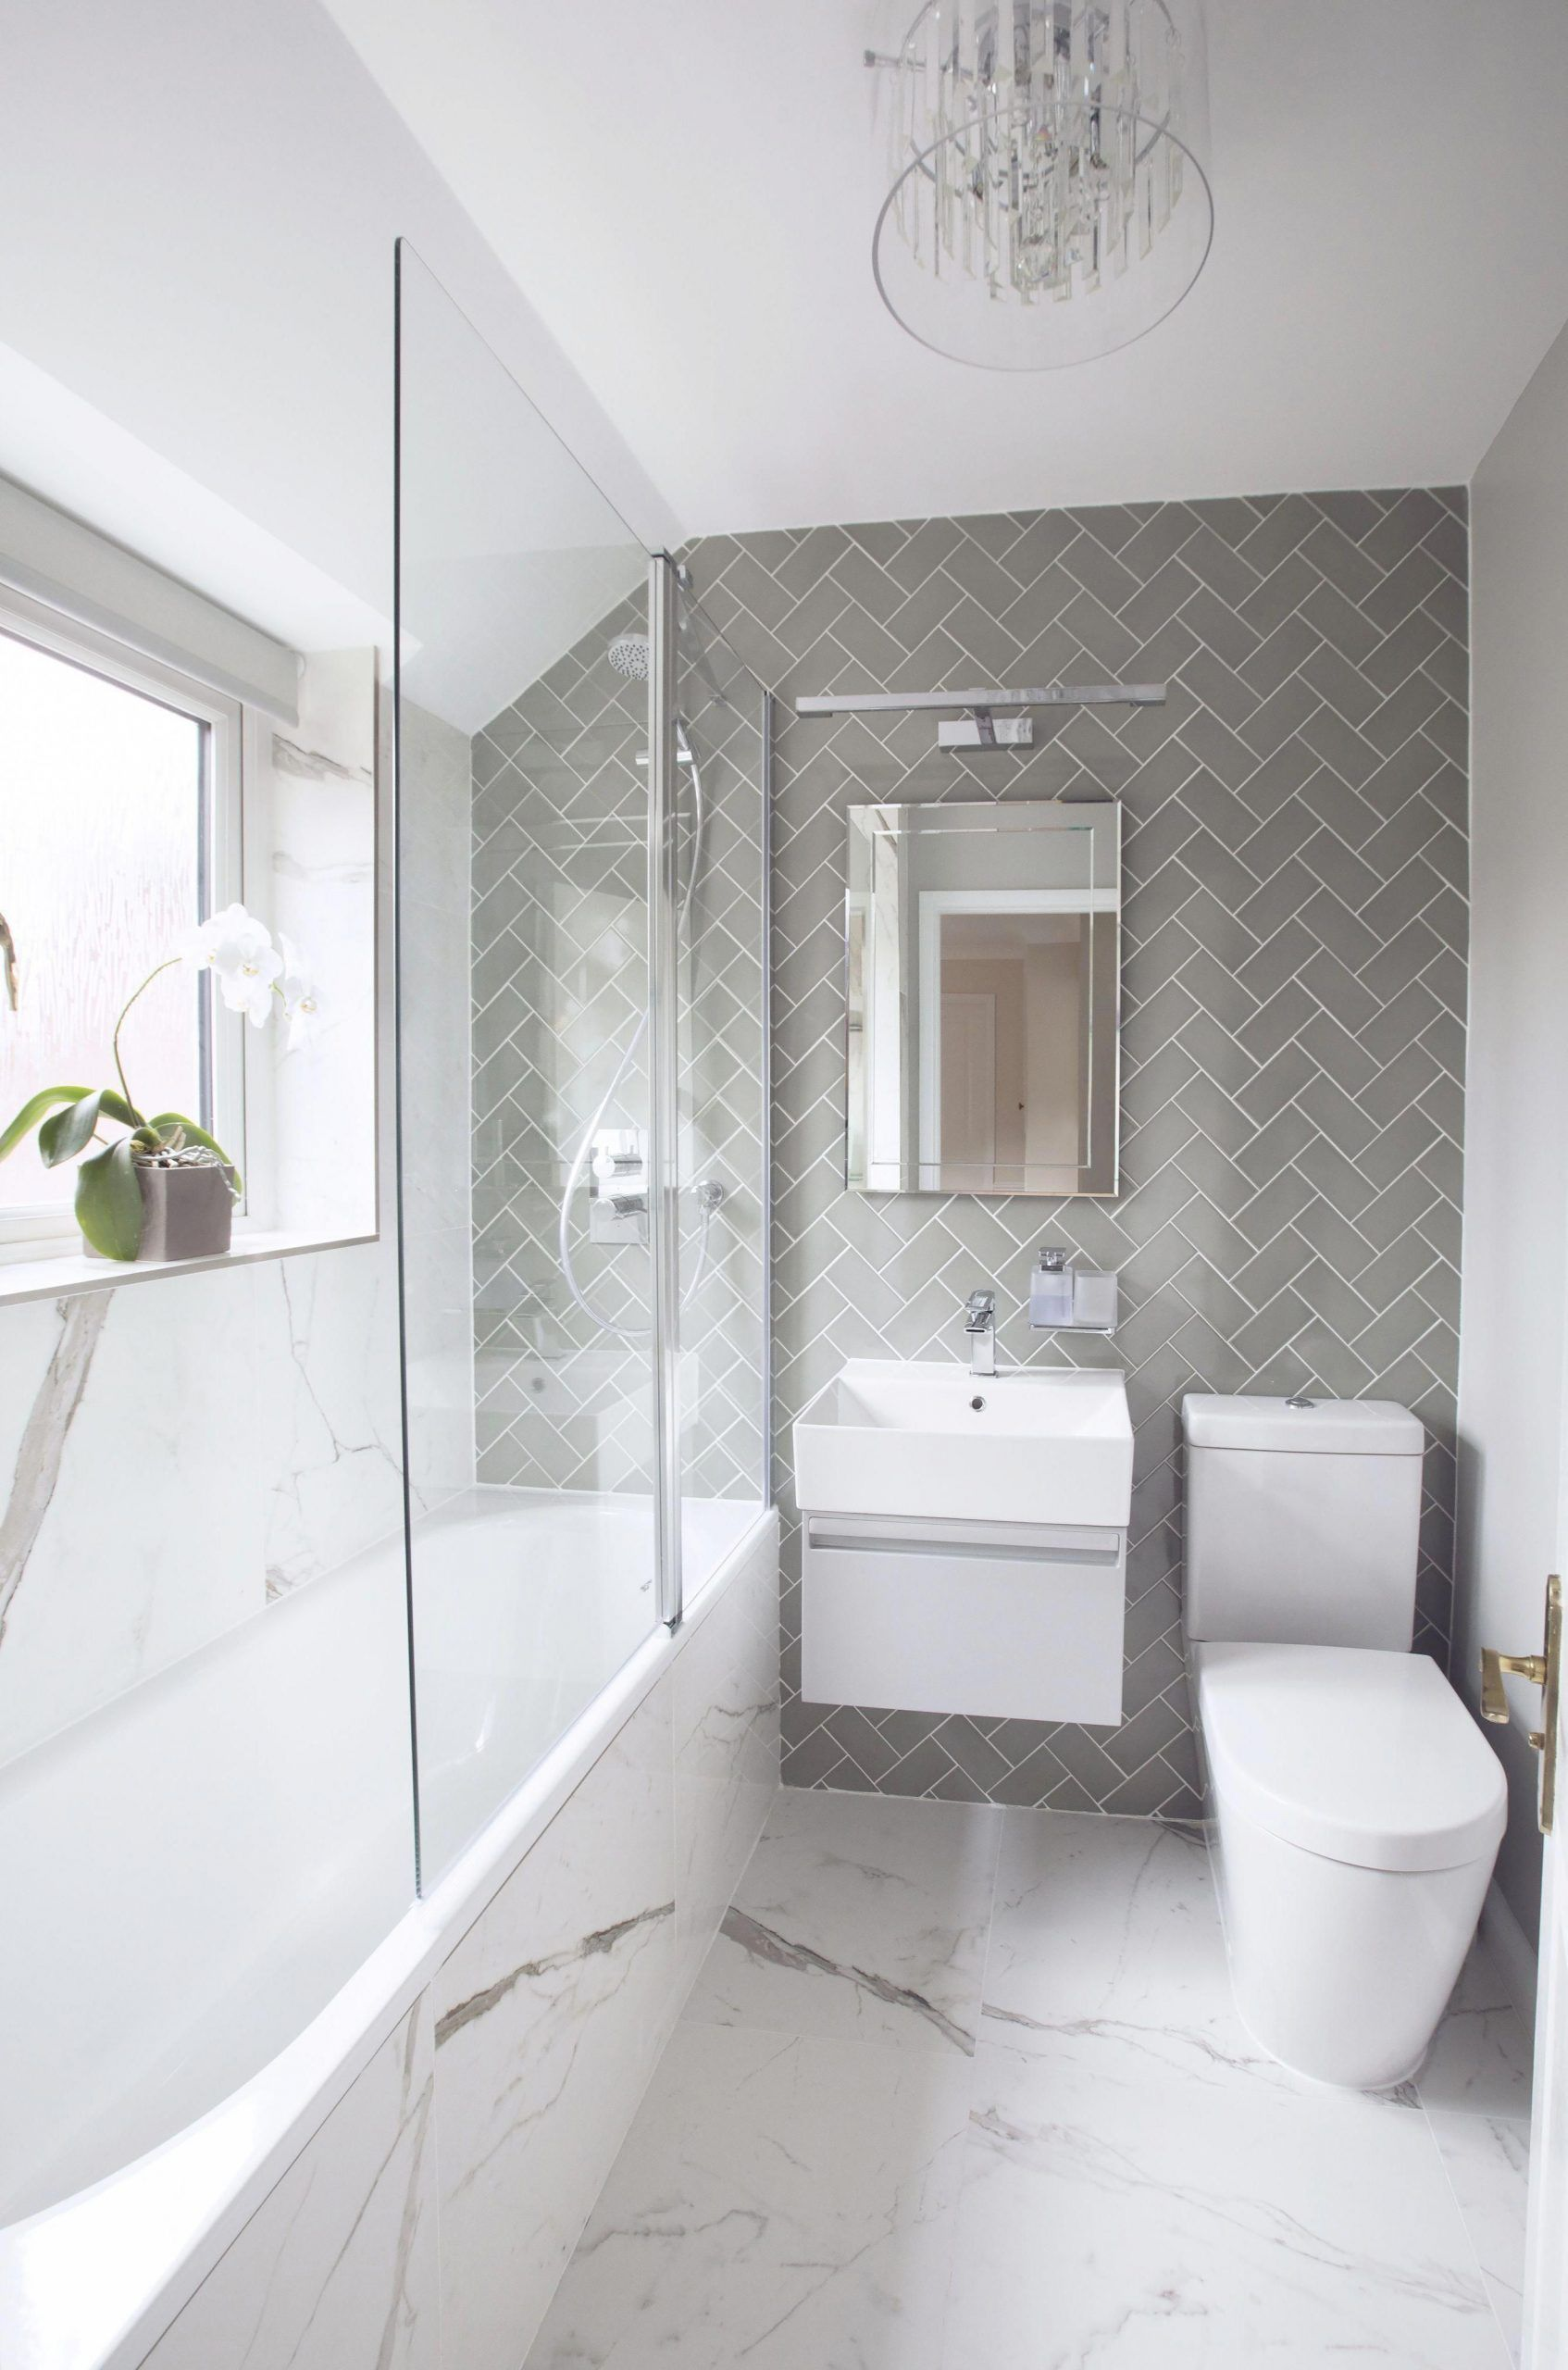 Bathroom Renovation Ideas For Small Bathrooms Australia Beside Bathroom Tile Acc Acc Austr In 2020 Small Bathroom Makeover Bathroom Interior Design Bathroom Design